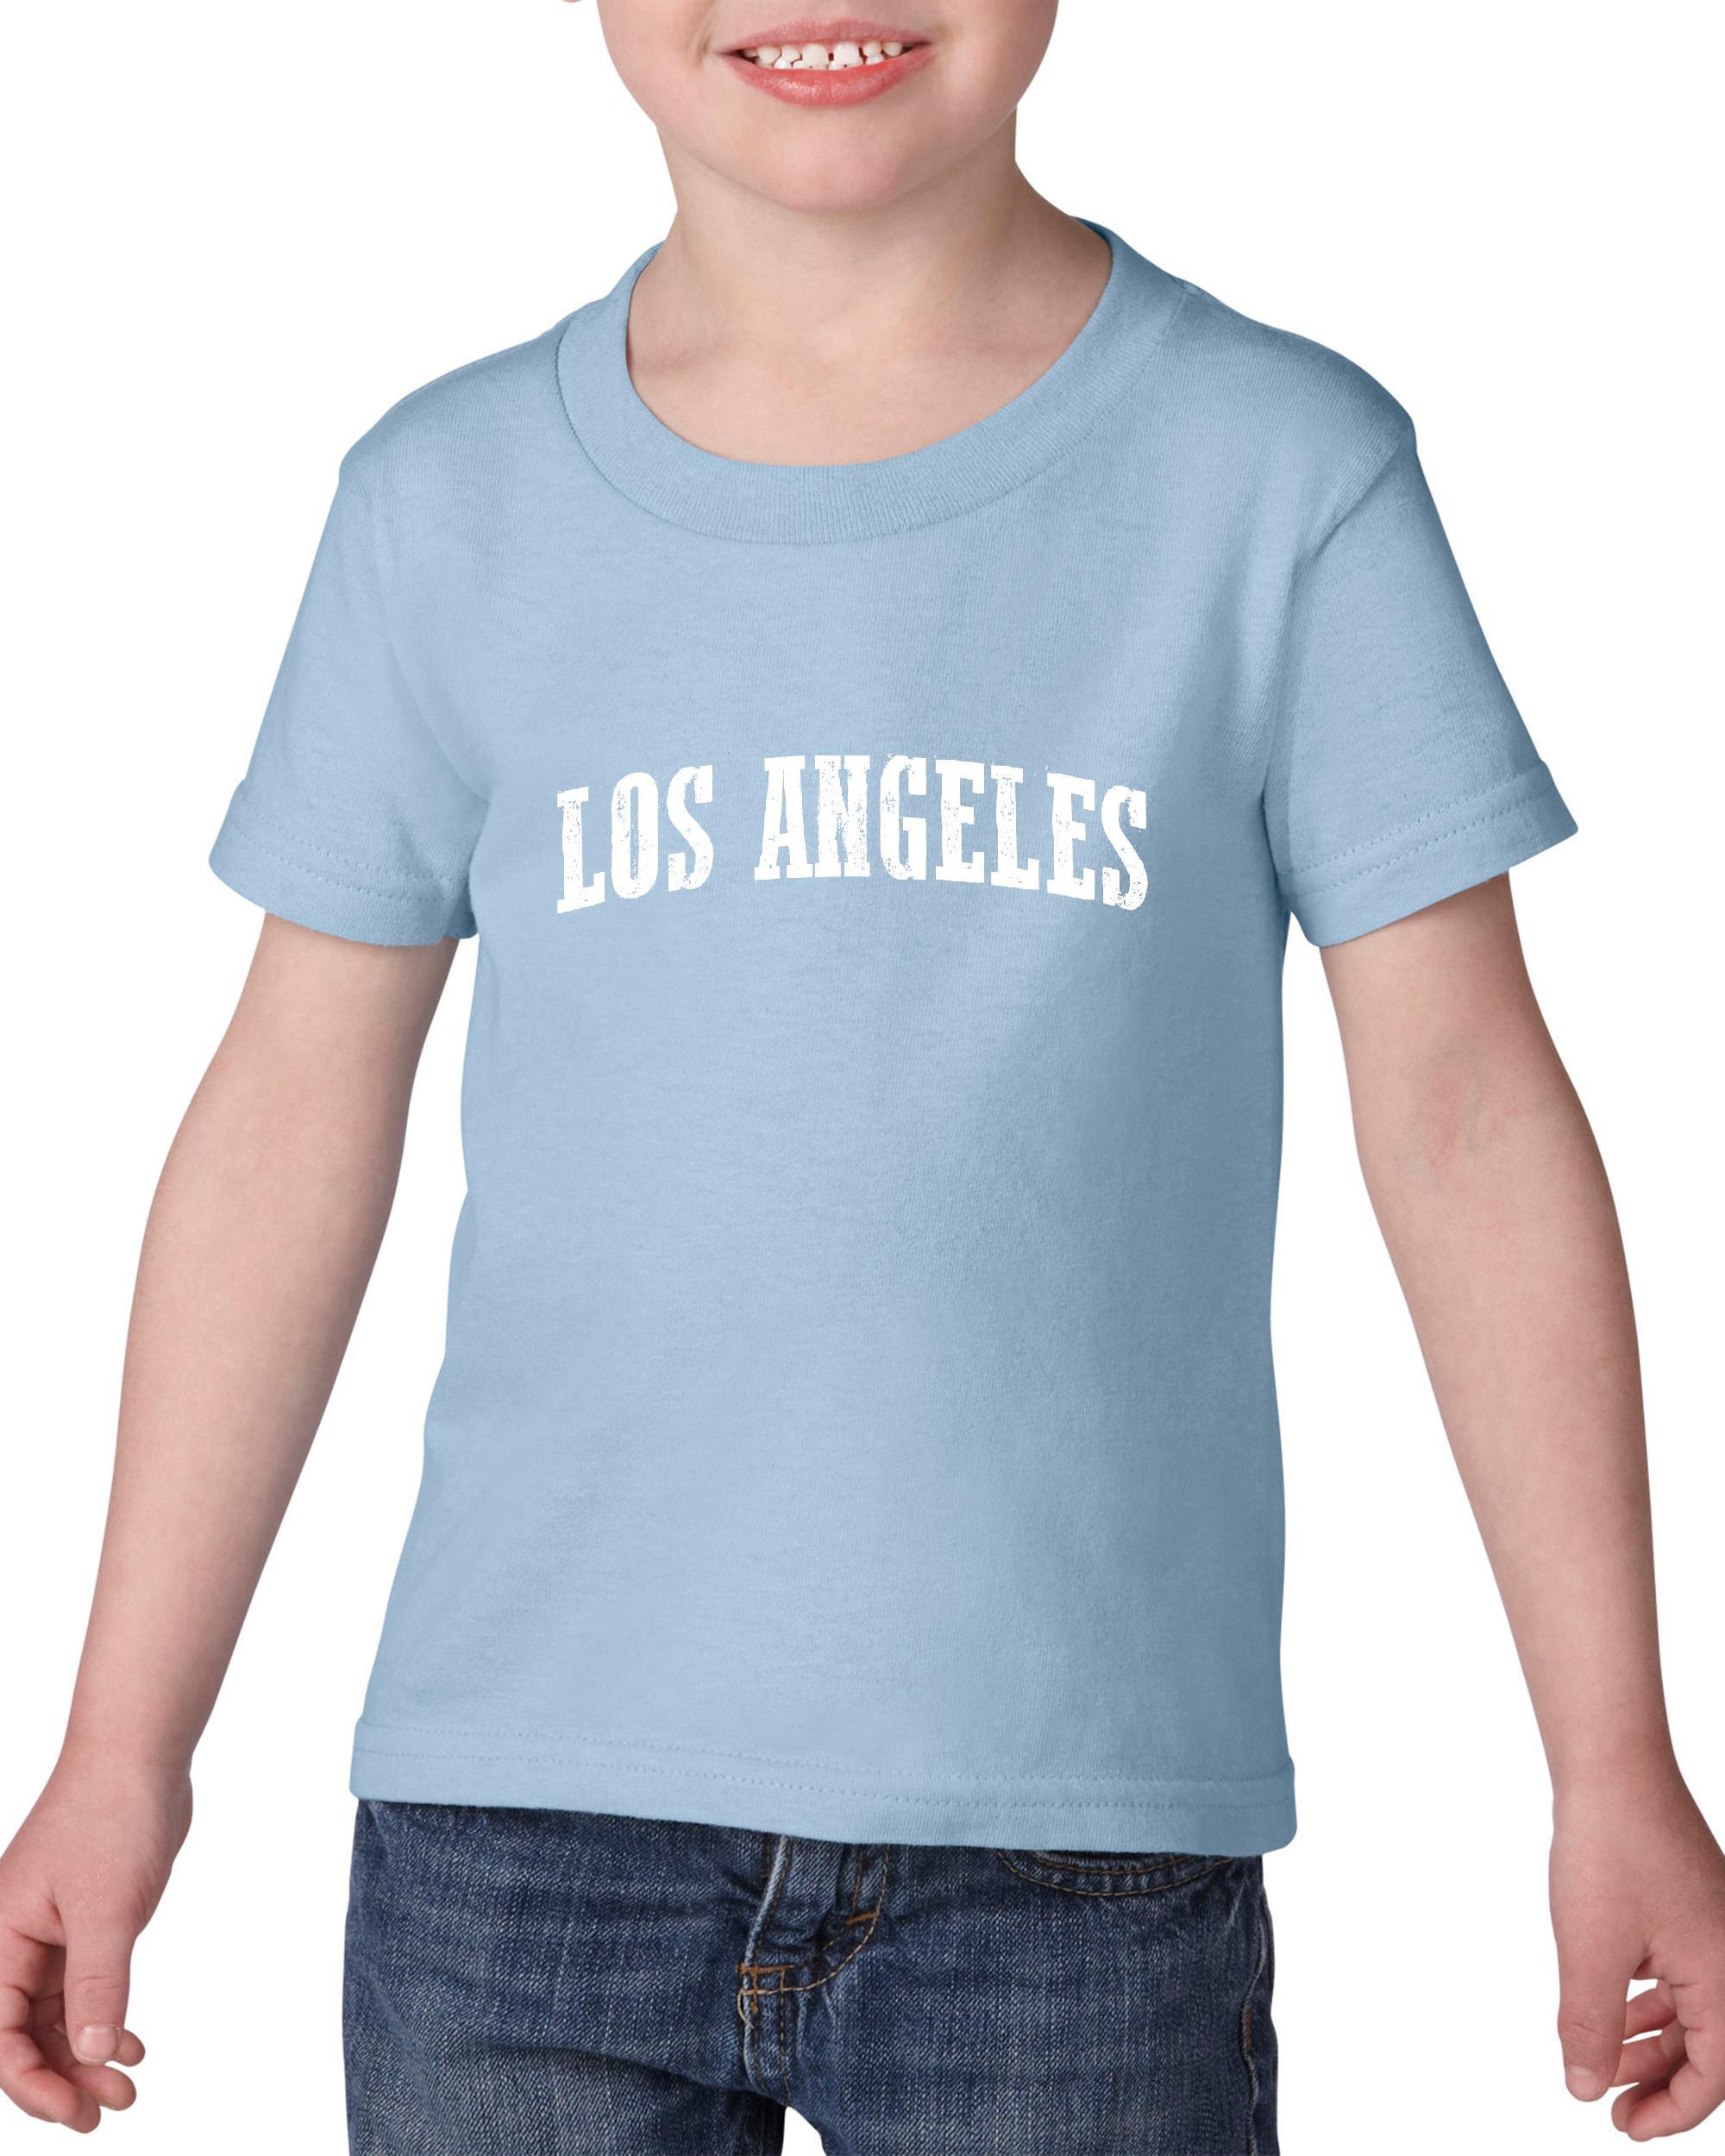 Artix Los Angeles CA California Map Flag Home of University of UCLA USC CSLA Heavy Cotton Toddler Kids T-Shirt Tee Clothing